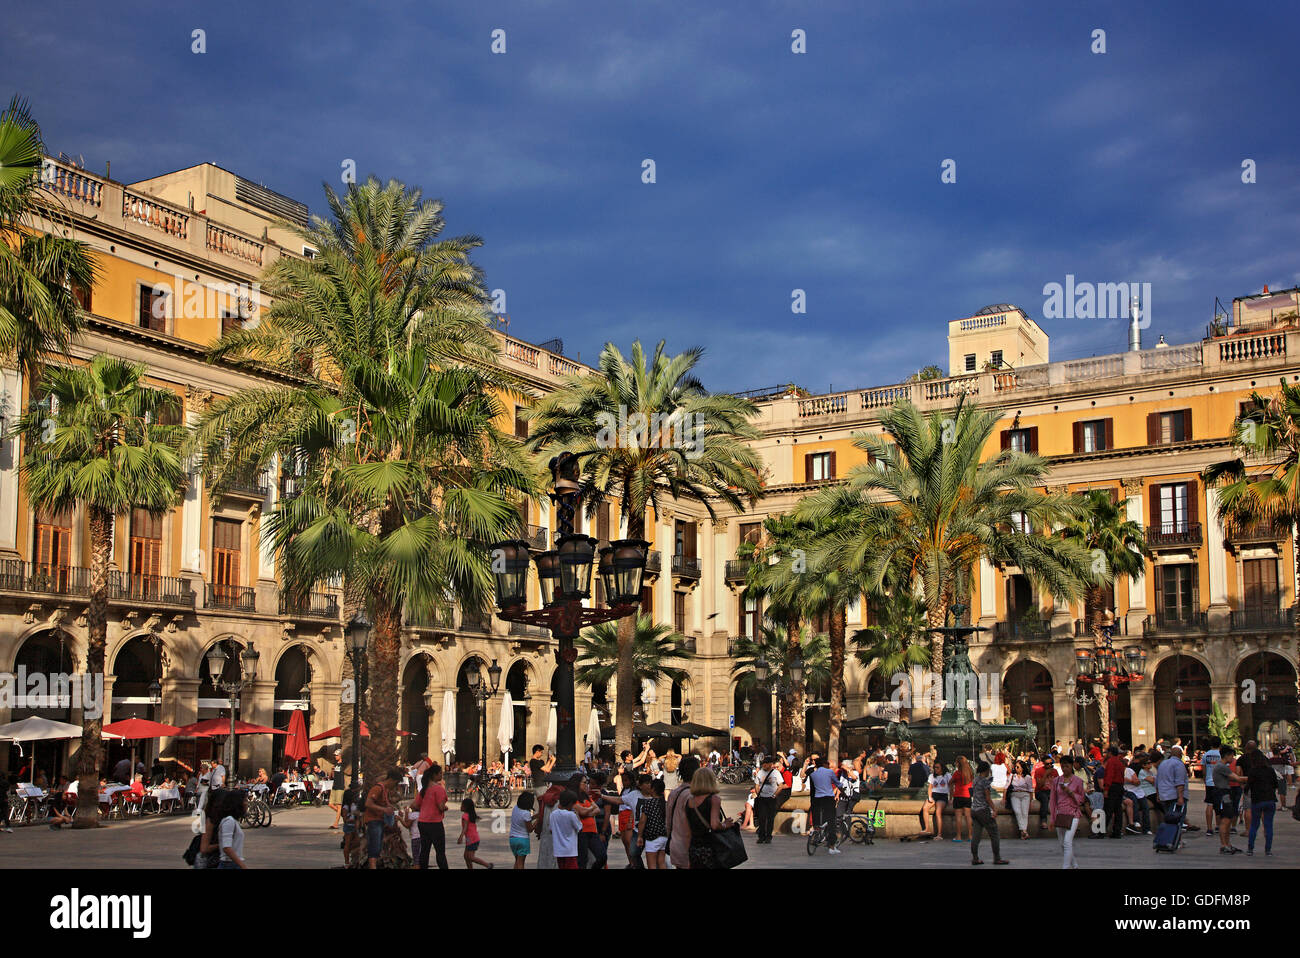 The Placa Reial, (Royal square), next to La Rambla, Barri Gotic (Gothic quarter), Barcelona, Catalonia, Spain - Stock Image